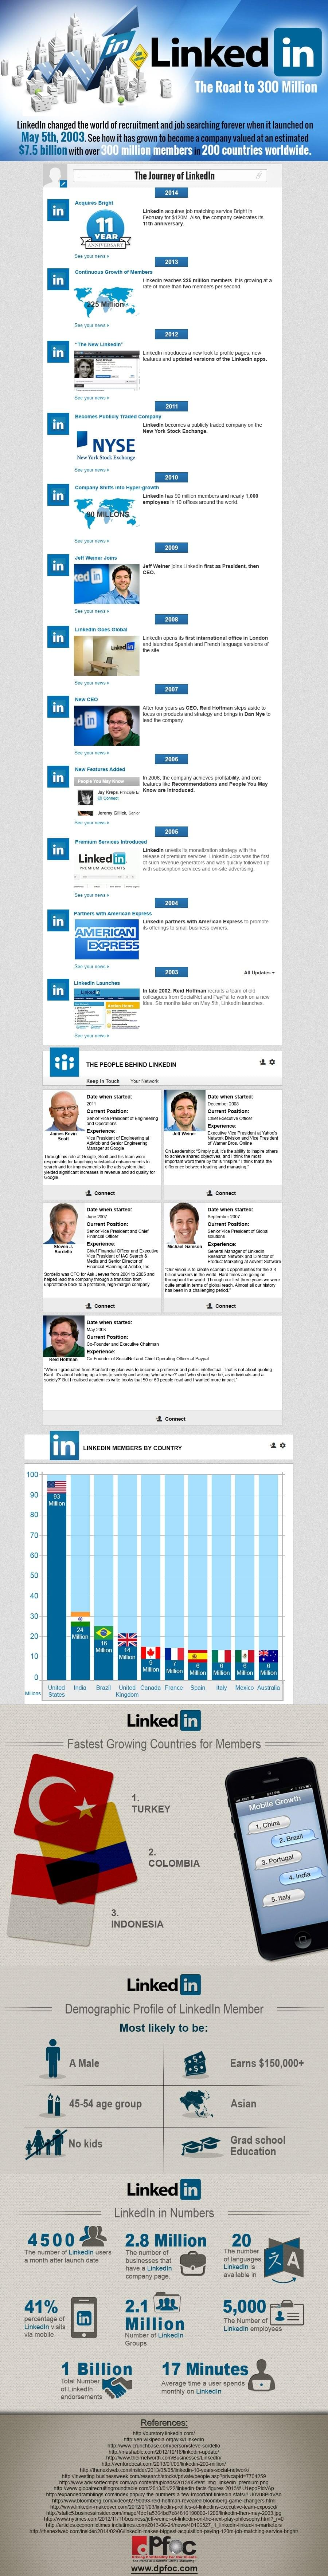 linkedin infographic 2014